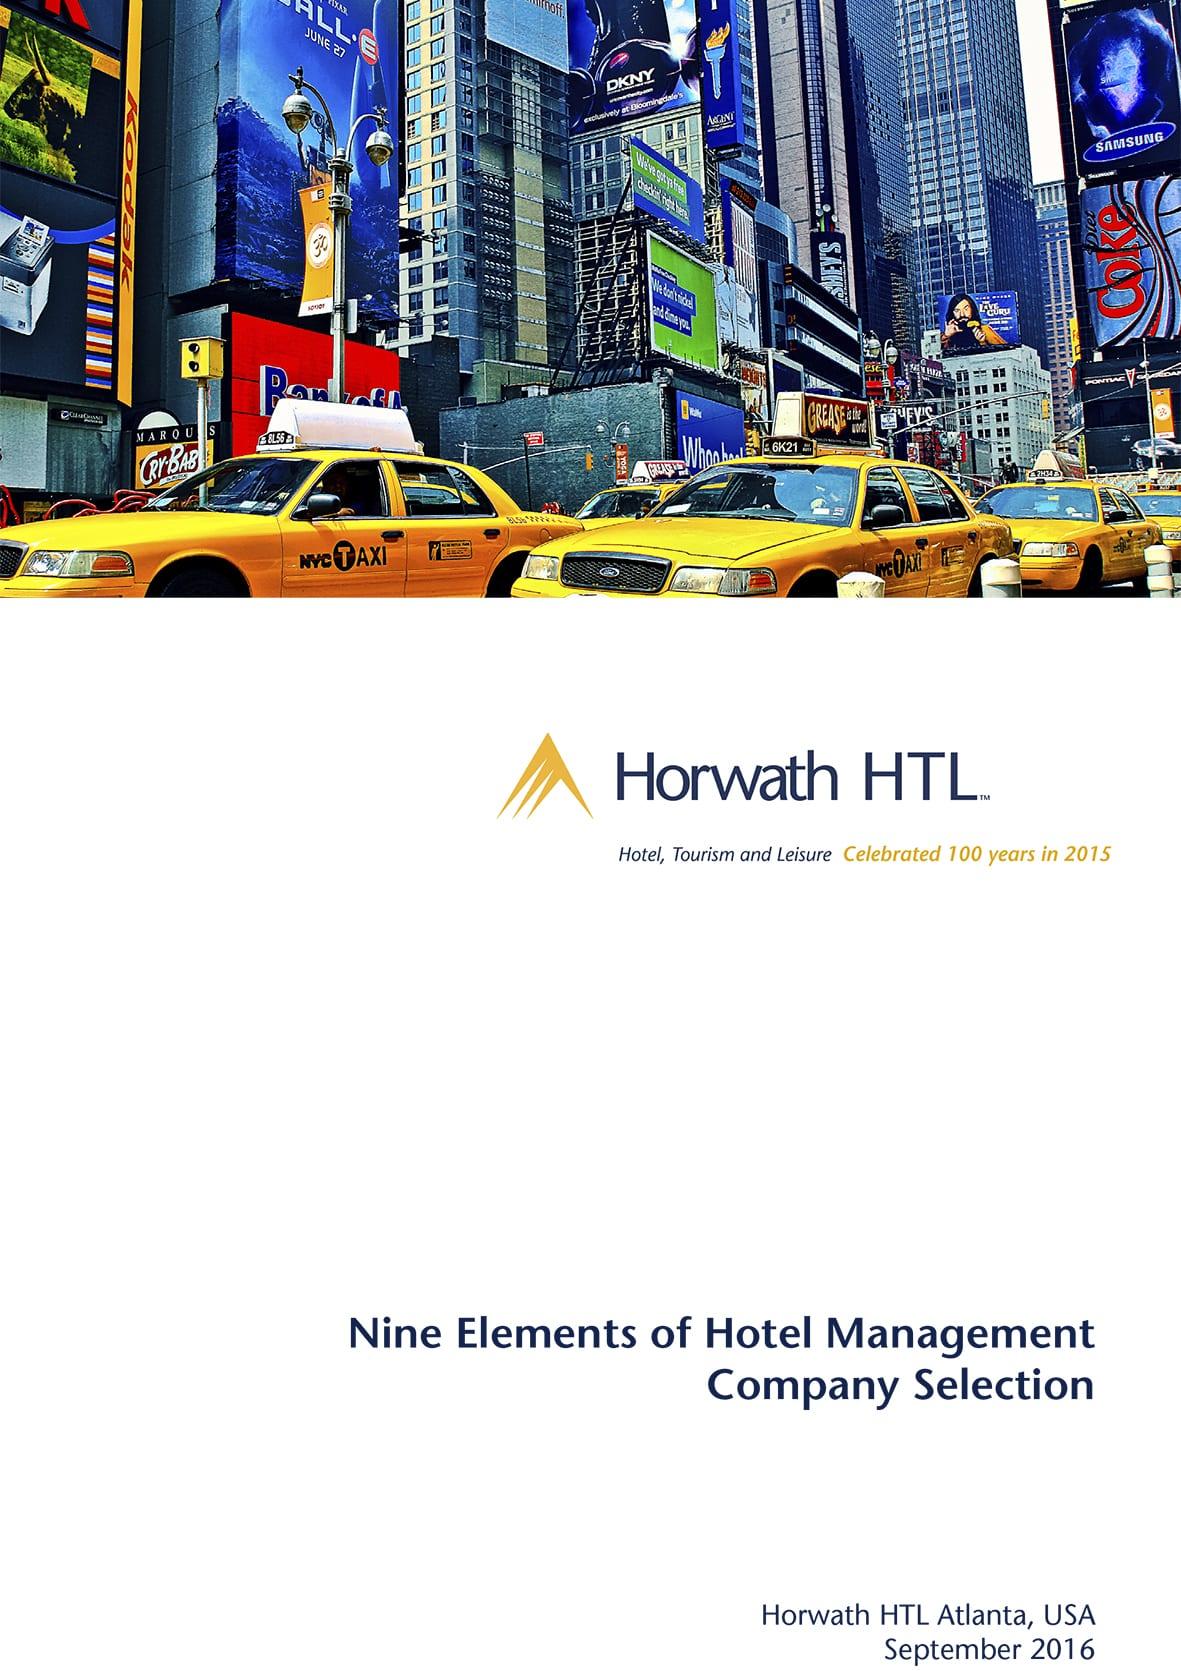 Nine Elements of Hotel Management Company Selection 1